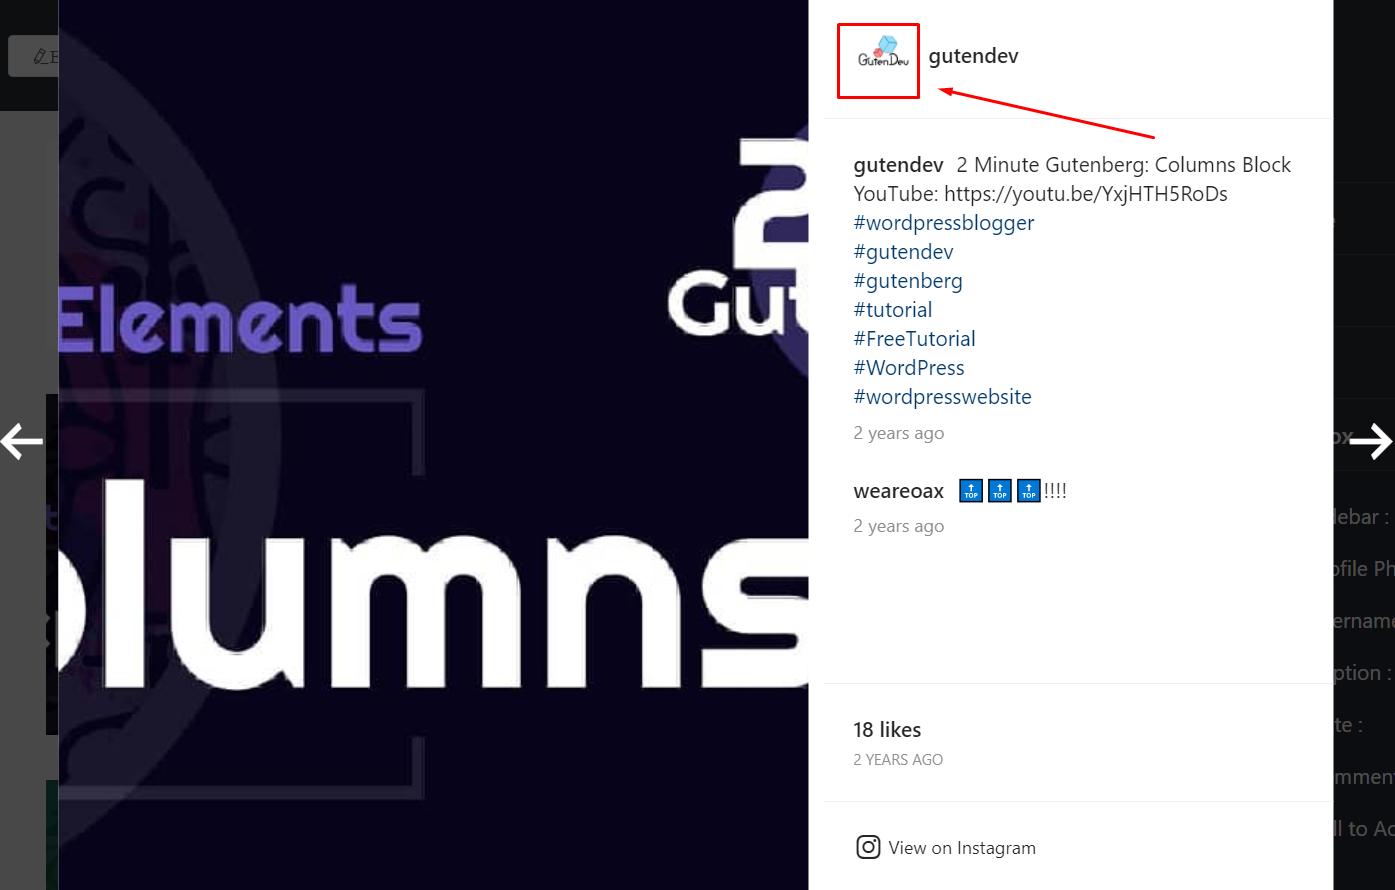 Display profile photo Instagram settings